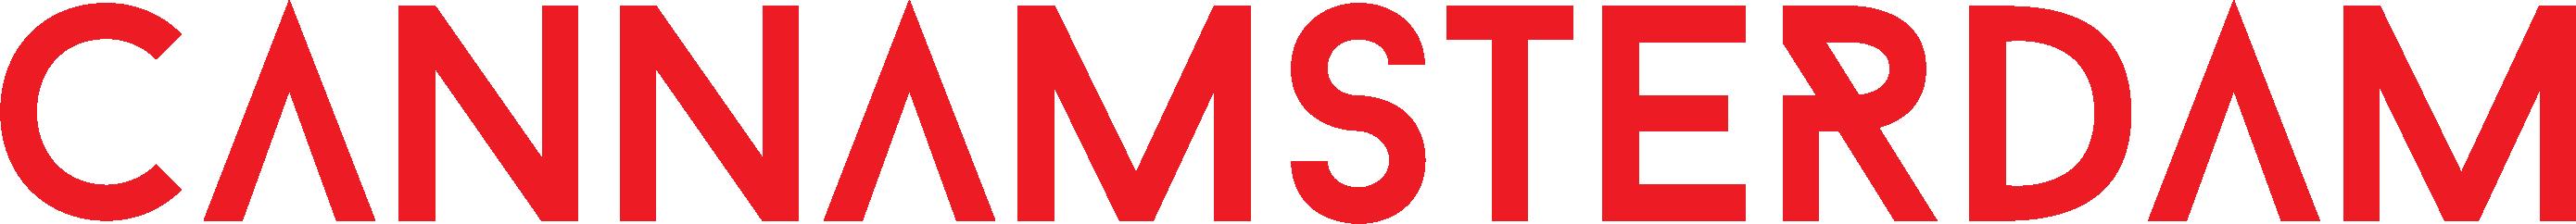 CannAmsterdam_Logo_RED